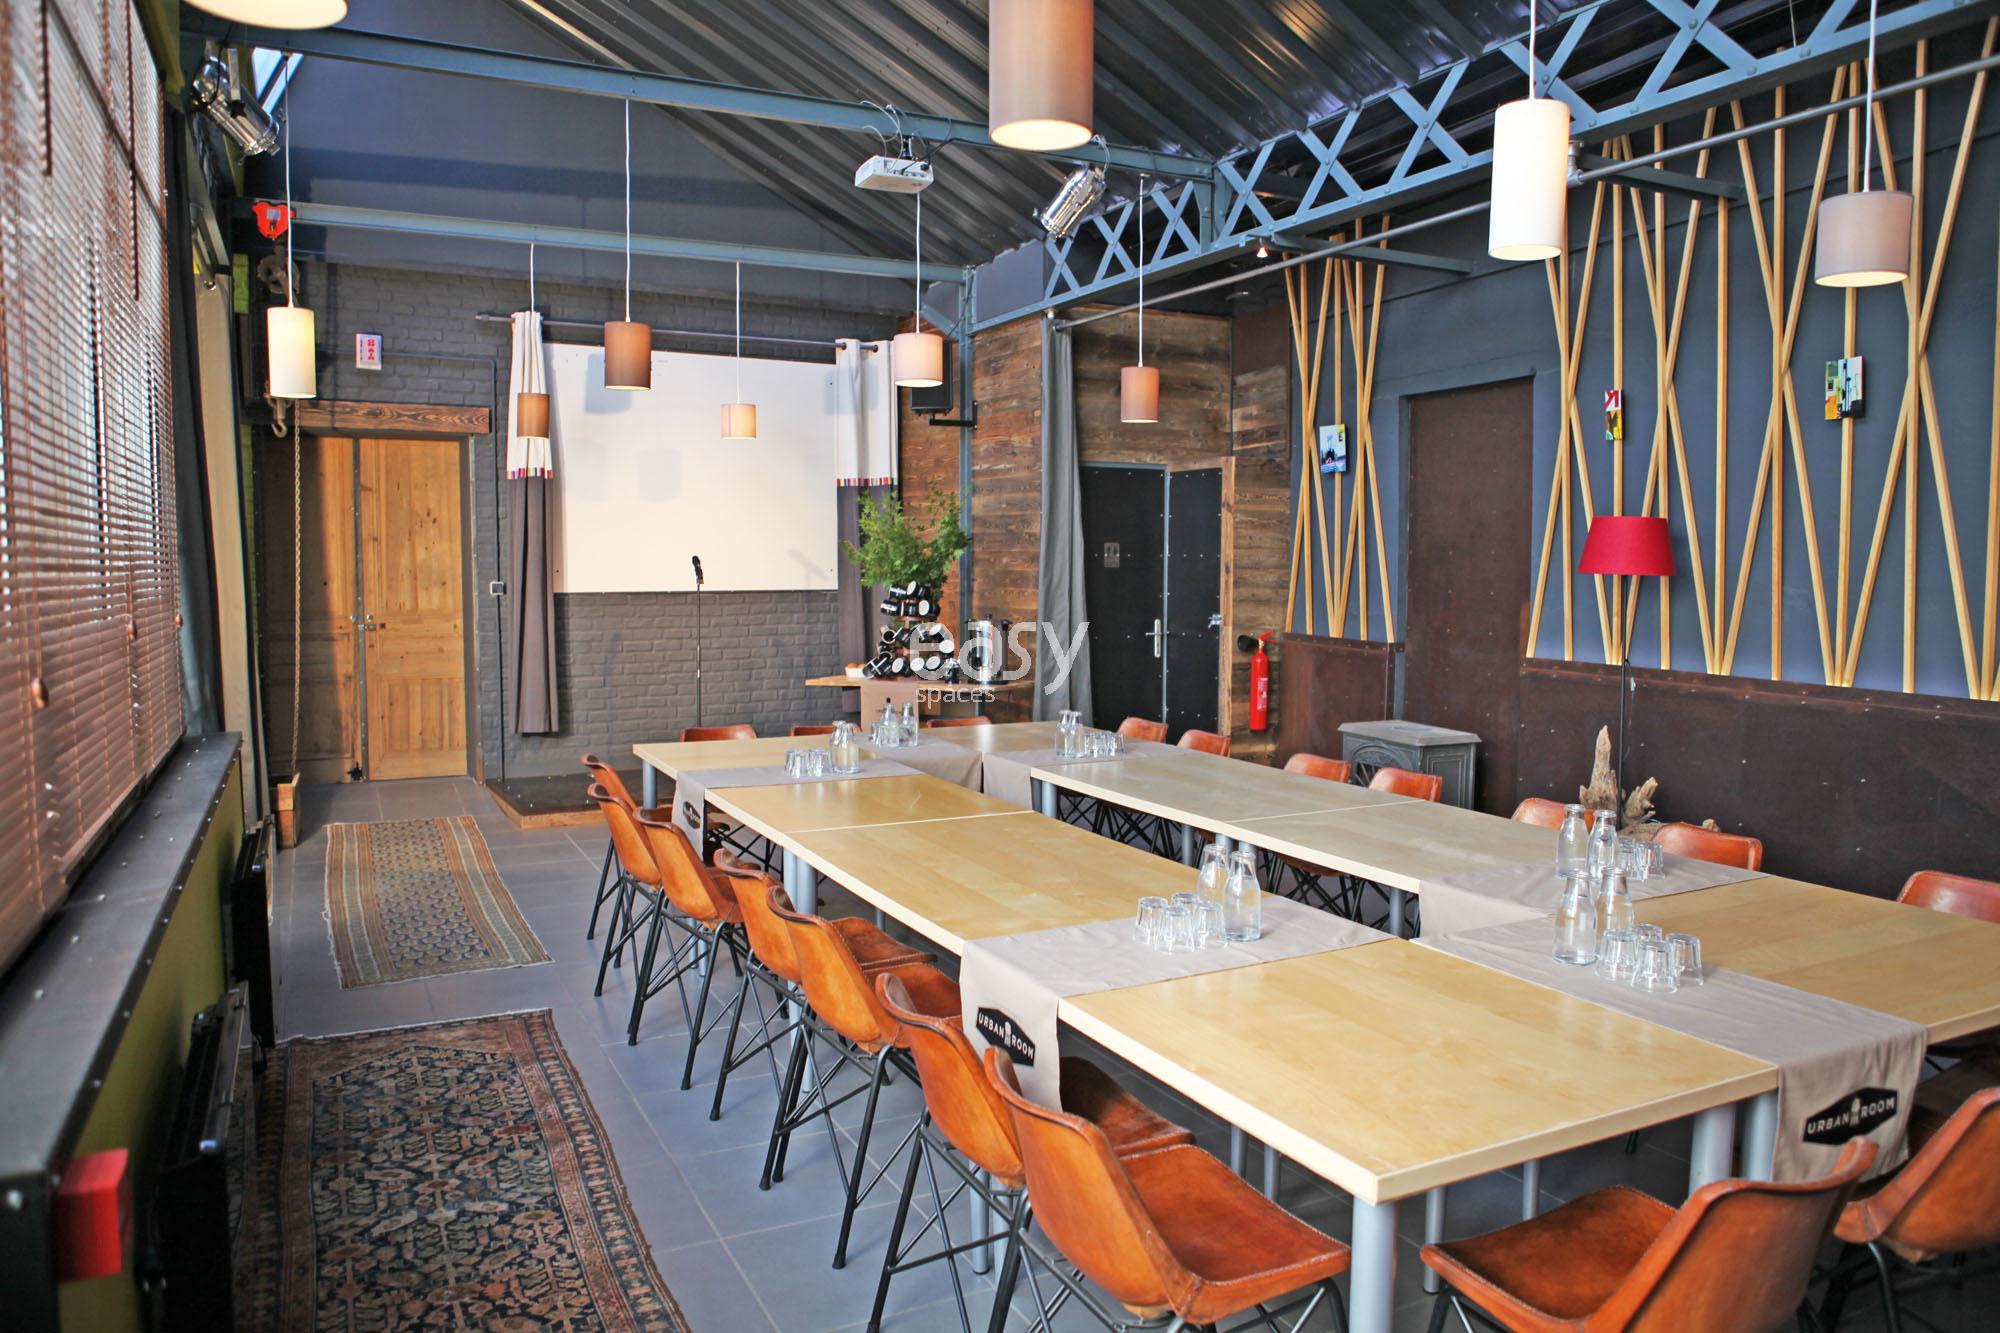 espace lyon mobilier de bureau bureau oprationnel faade espace pro lyon espace foot espace. Black Bedroom Furniture Sets. Home Design Ideas